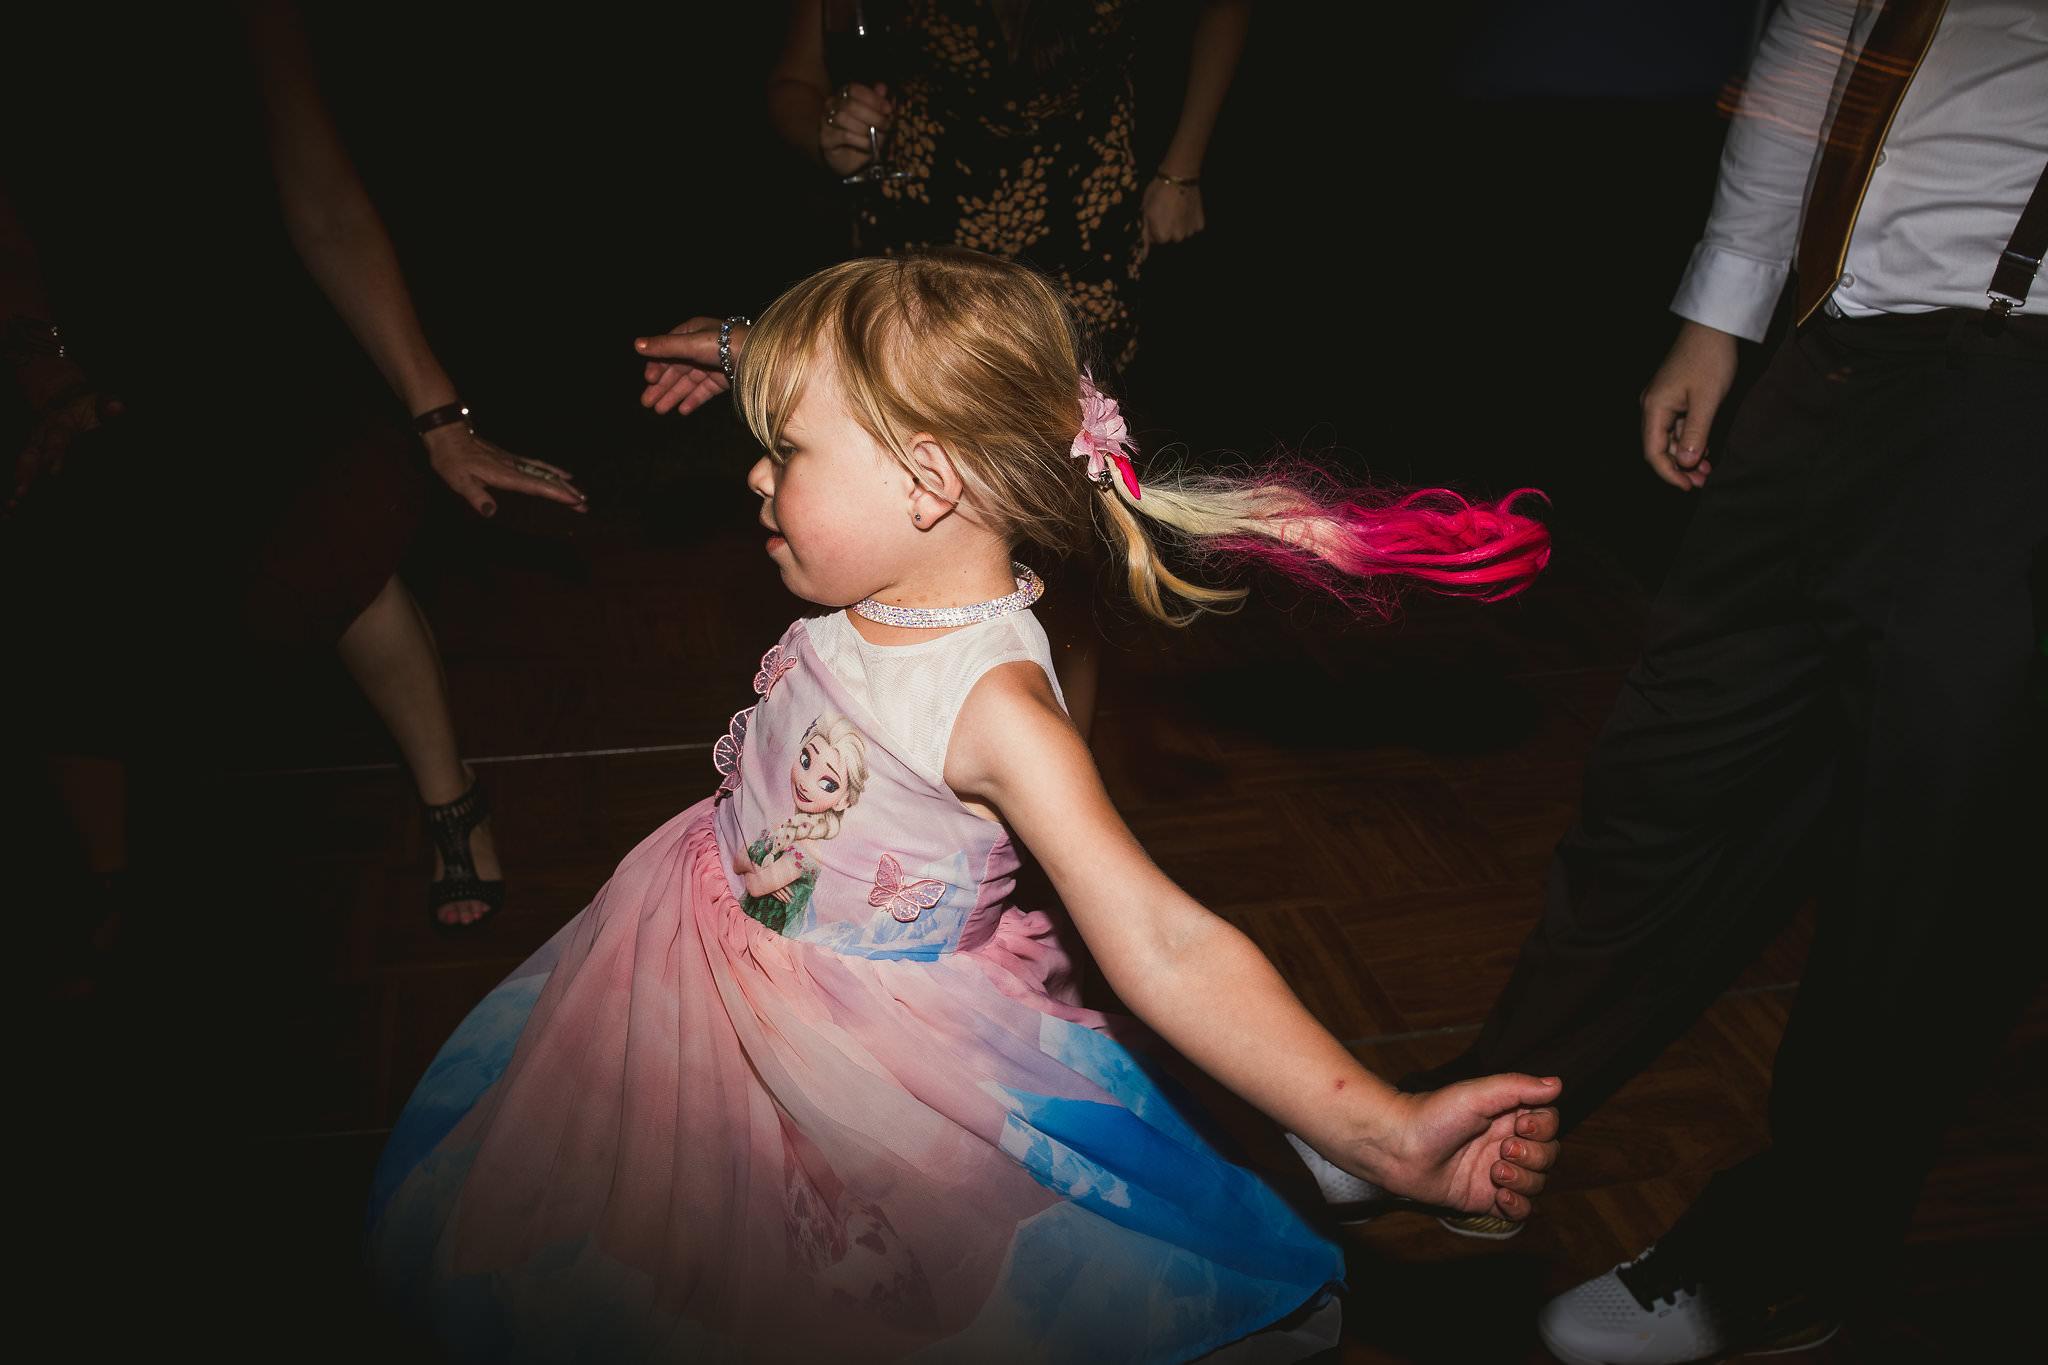 Kristen Adam Kindred Loft Whitby Wedding Photos 602 - Durham Wedding Photographer: Kindred Loft Wedding Photos